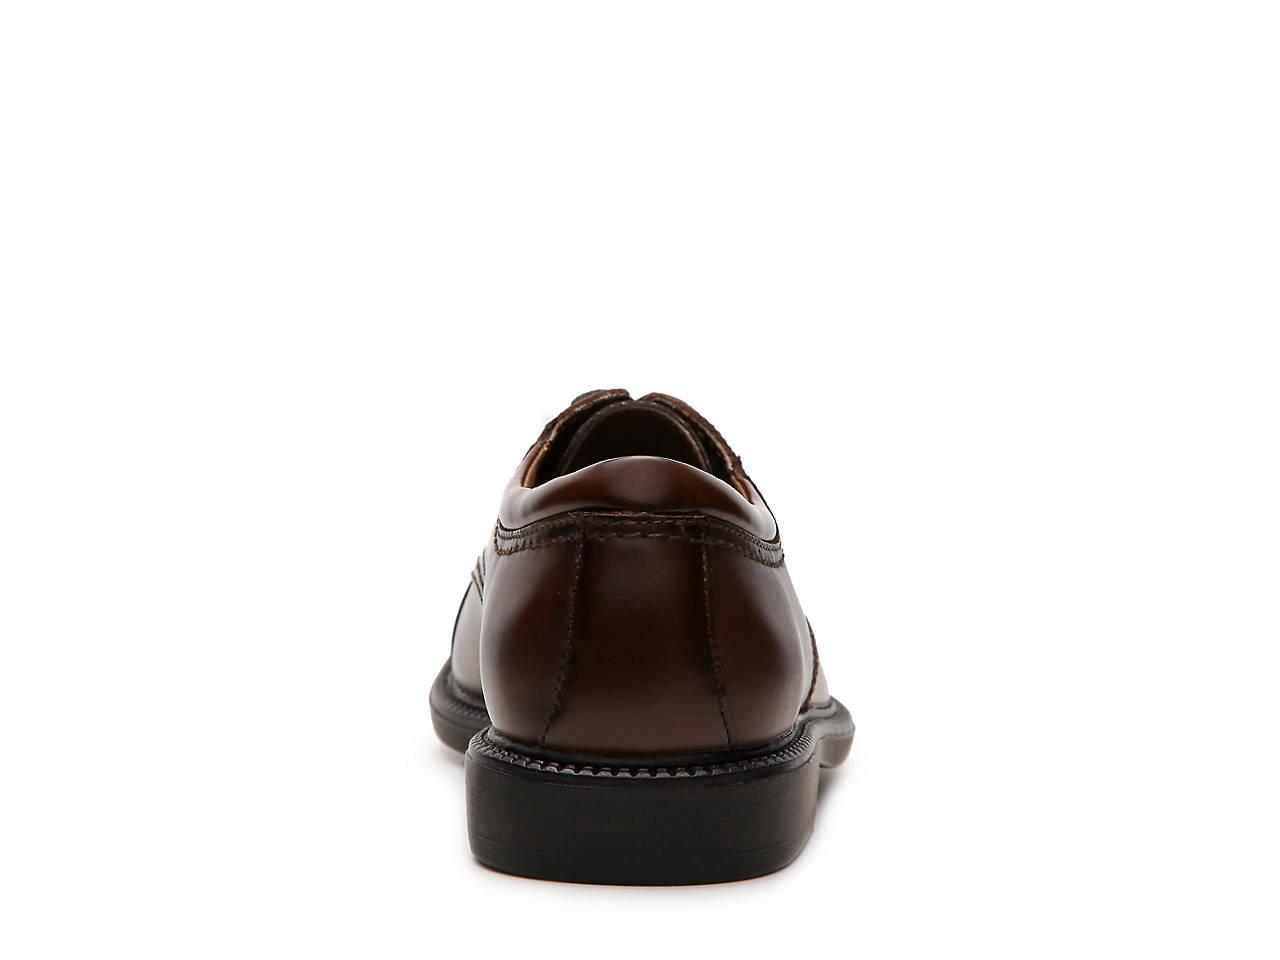 50309afae5c Dockers Gordon Cap Toe Oxford Men s Shoes